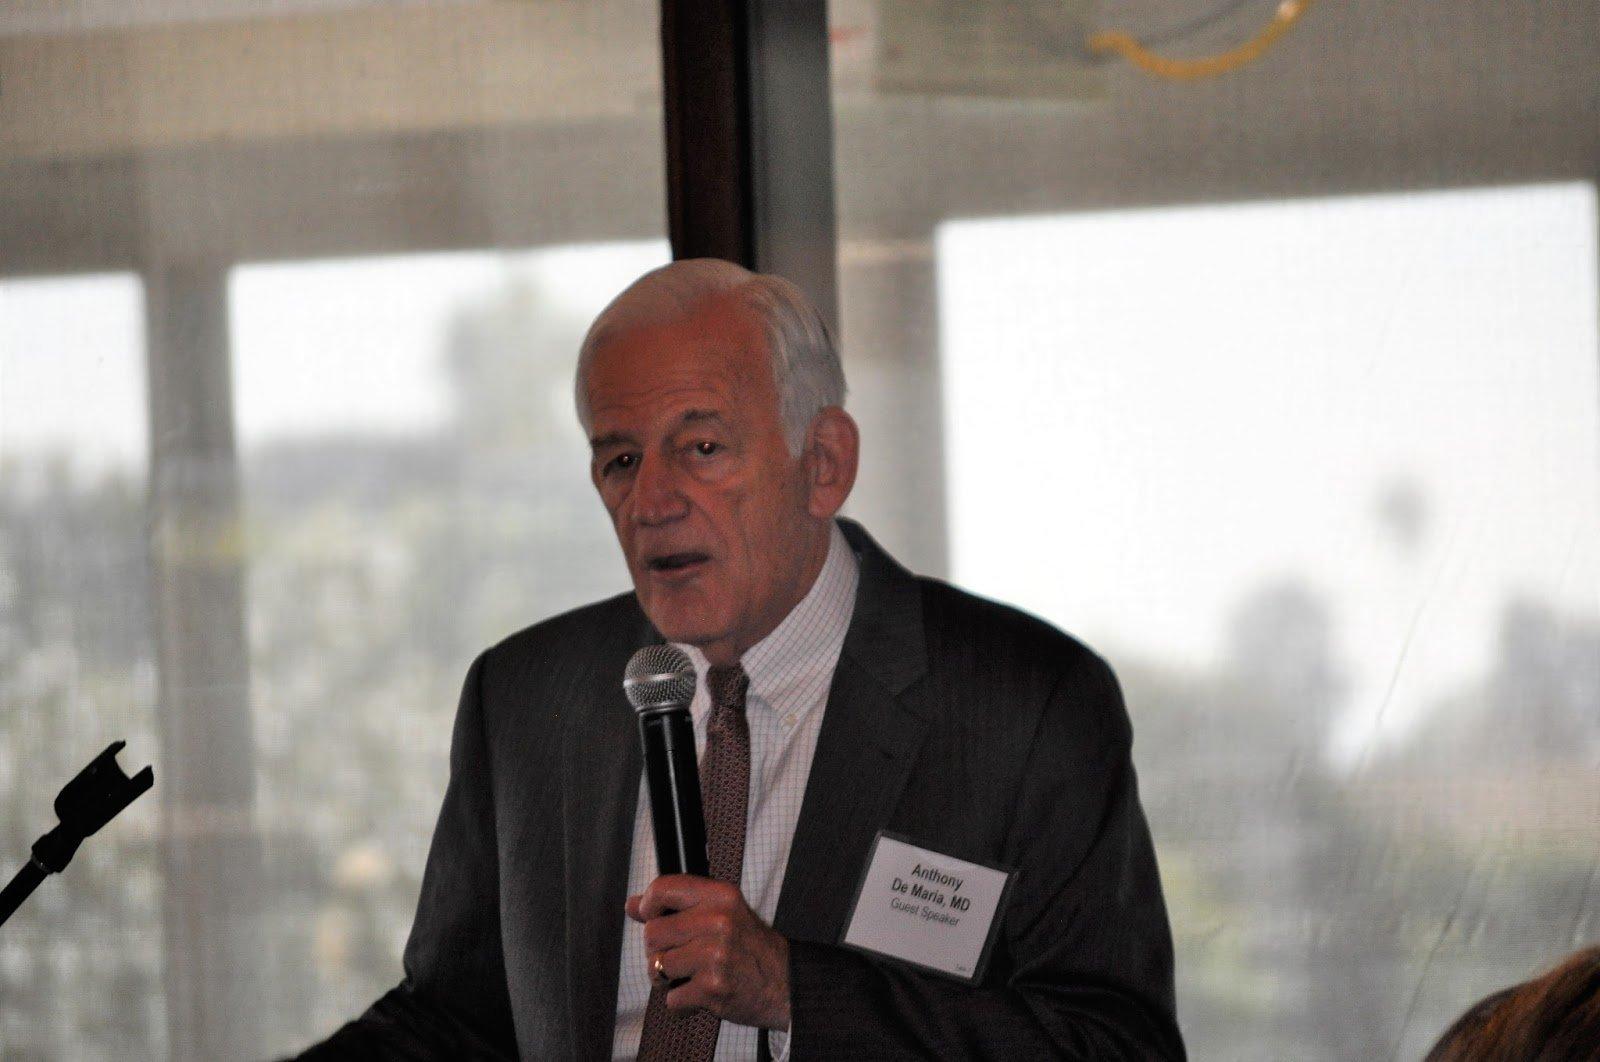 Dr. DeMaria speaks about Heart Disease